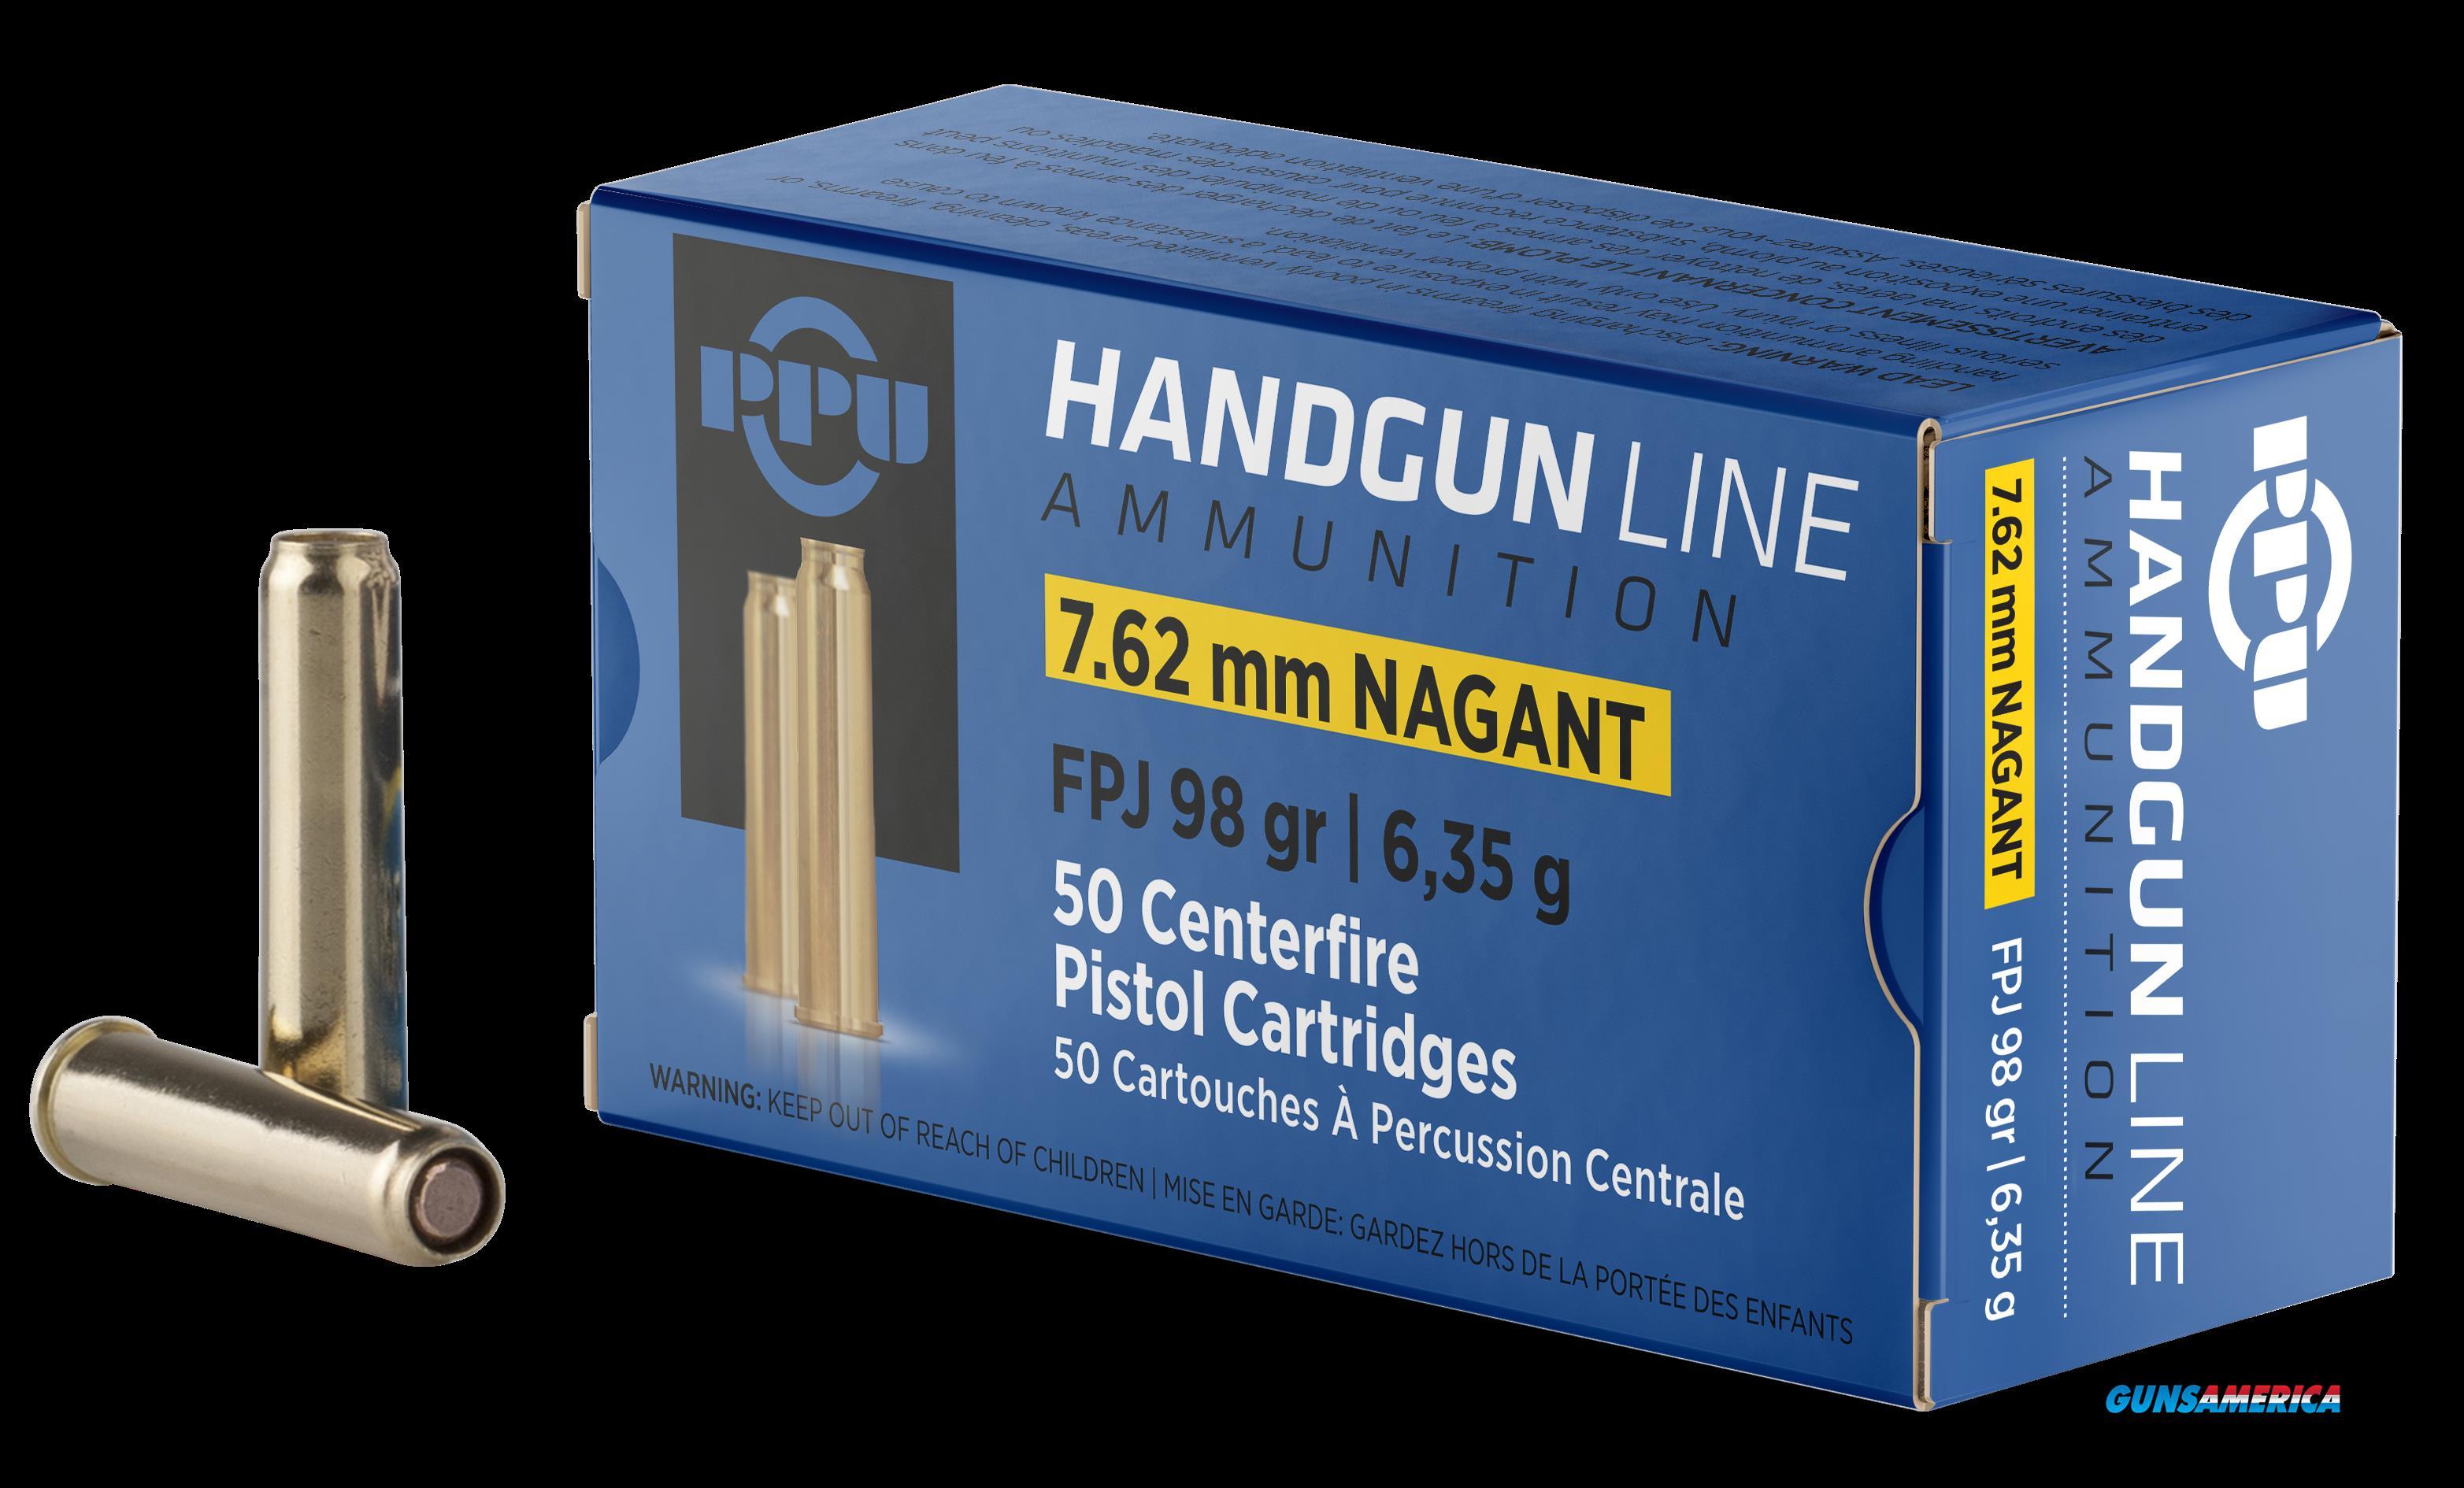 Ppu Handgun, Ppu Pph762n     7.62nag      98 Fpj          50-10  Guns > Pistols > 1911 Pistol Copies (non-Colt)